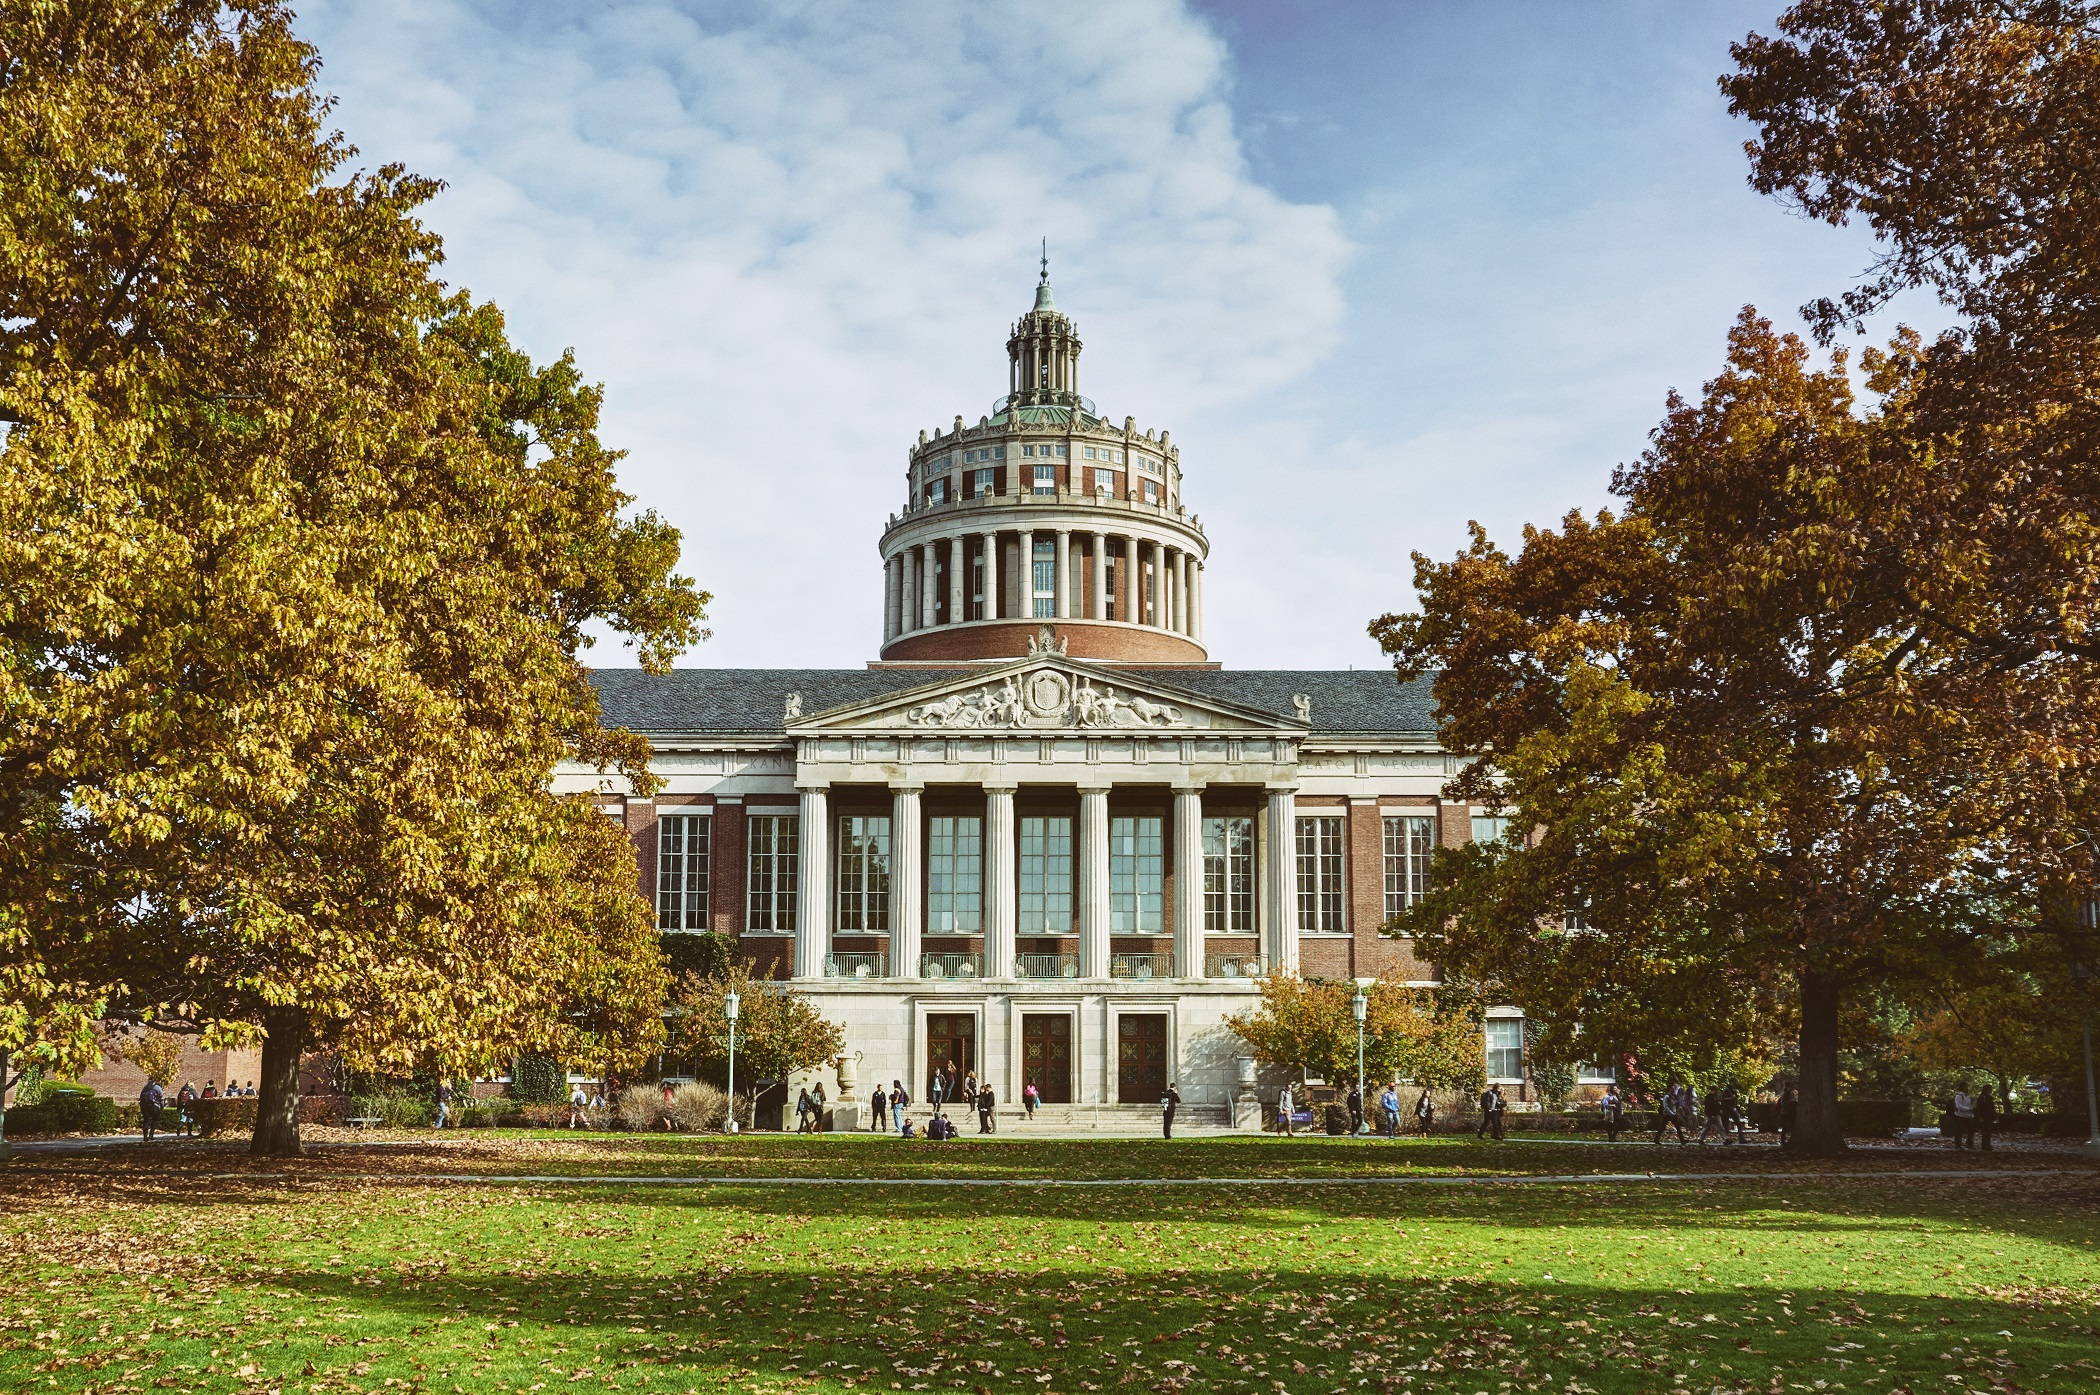 CARBON- University of Rochester NetImpact Chapter Partnership - Summer Internship Experience